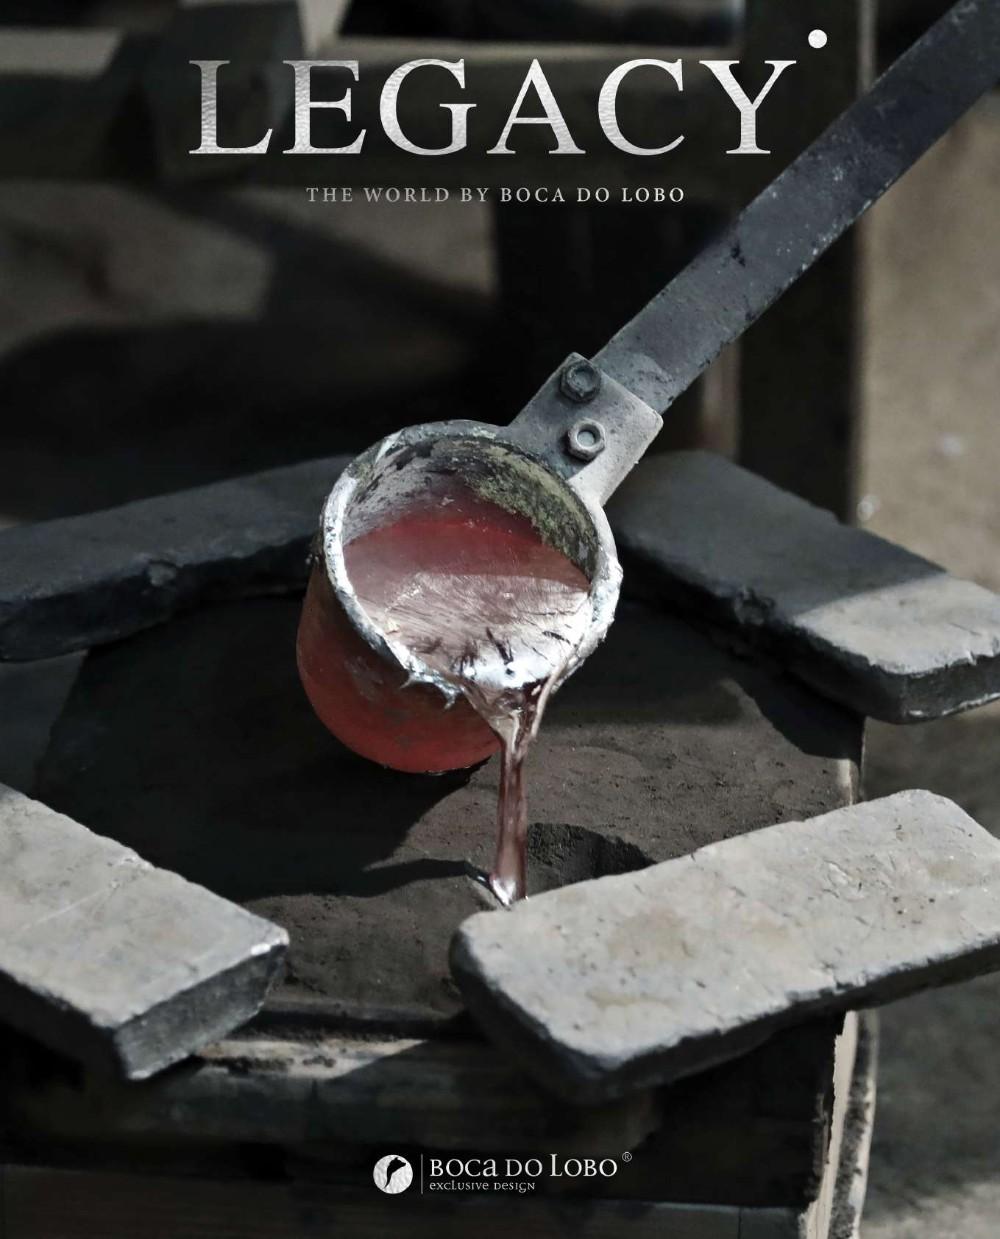 design Legacy: Design and Craftsmanship Testimony by Boca do Lobo legacy 2 magazine by boca do lobo 000